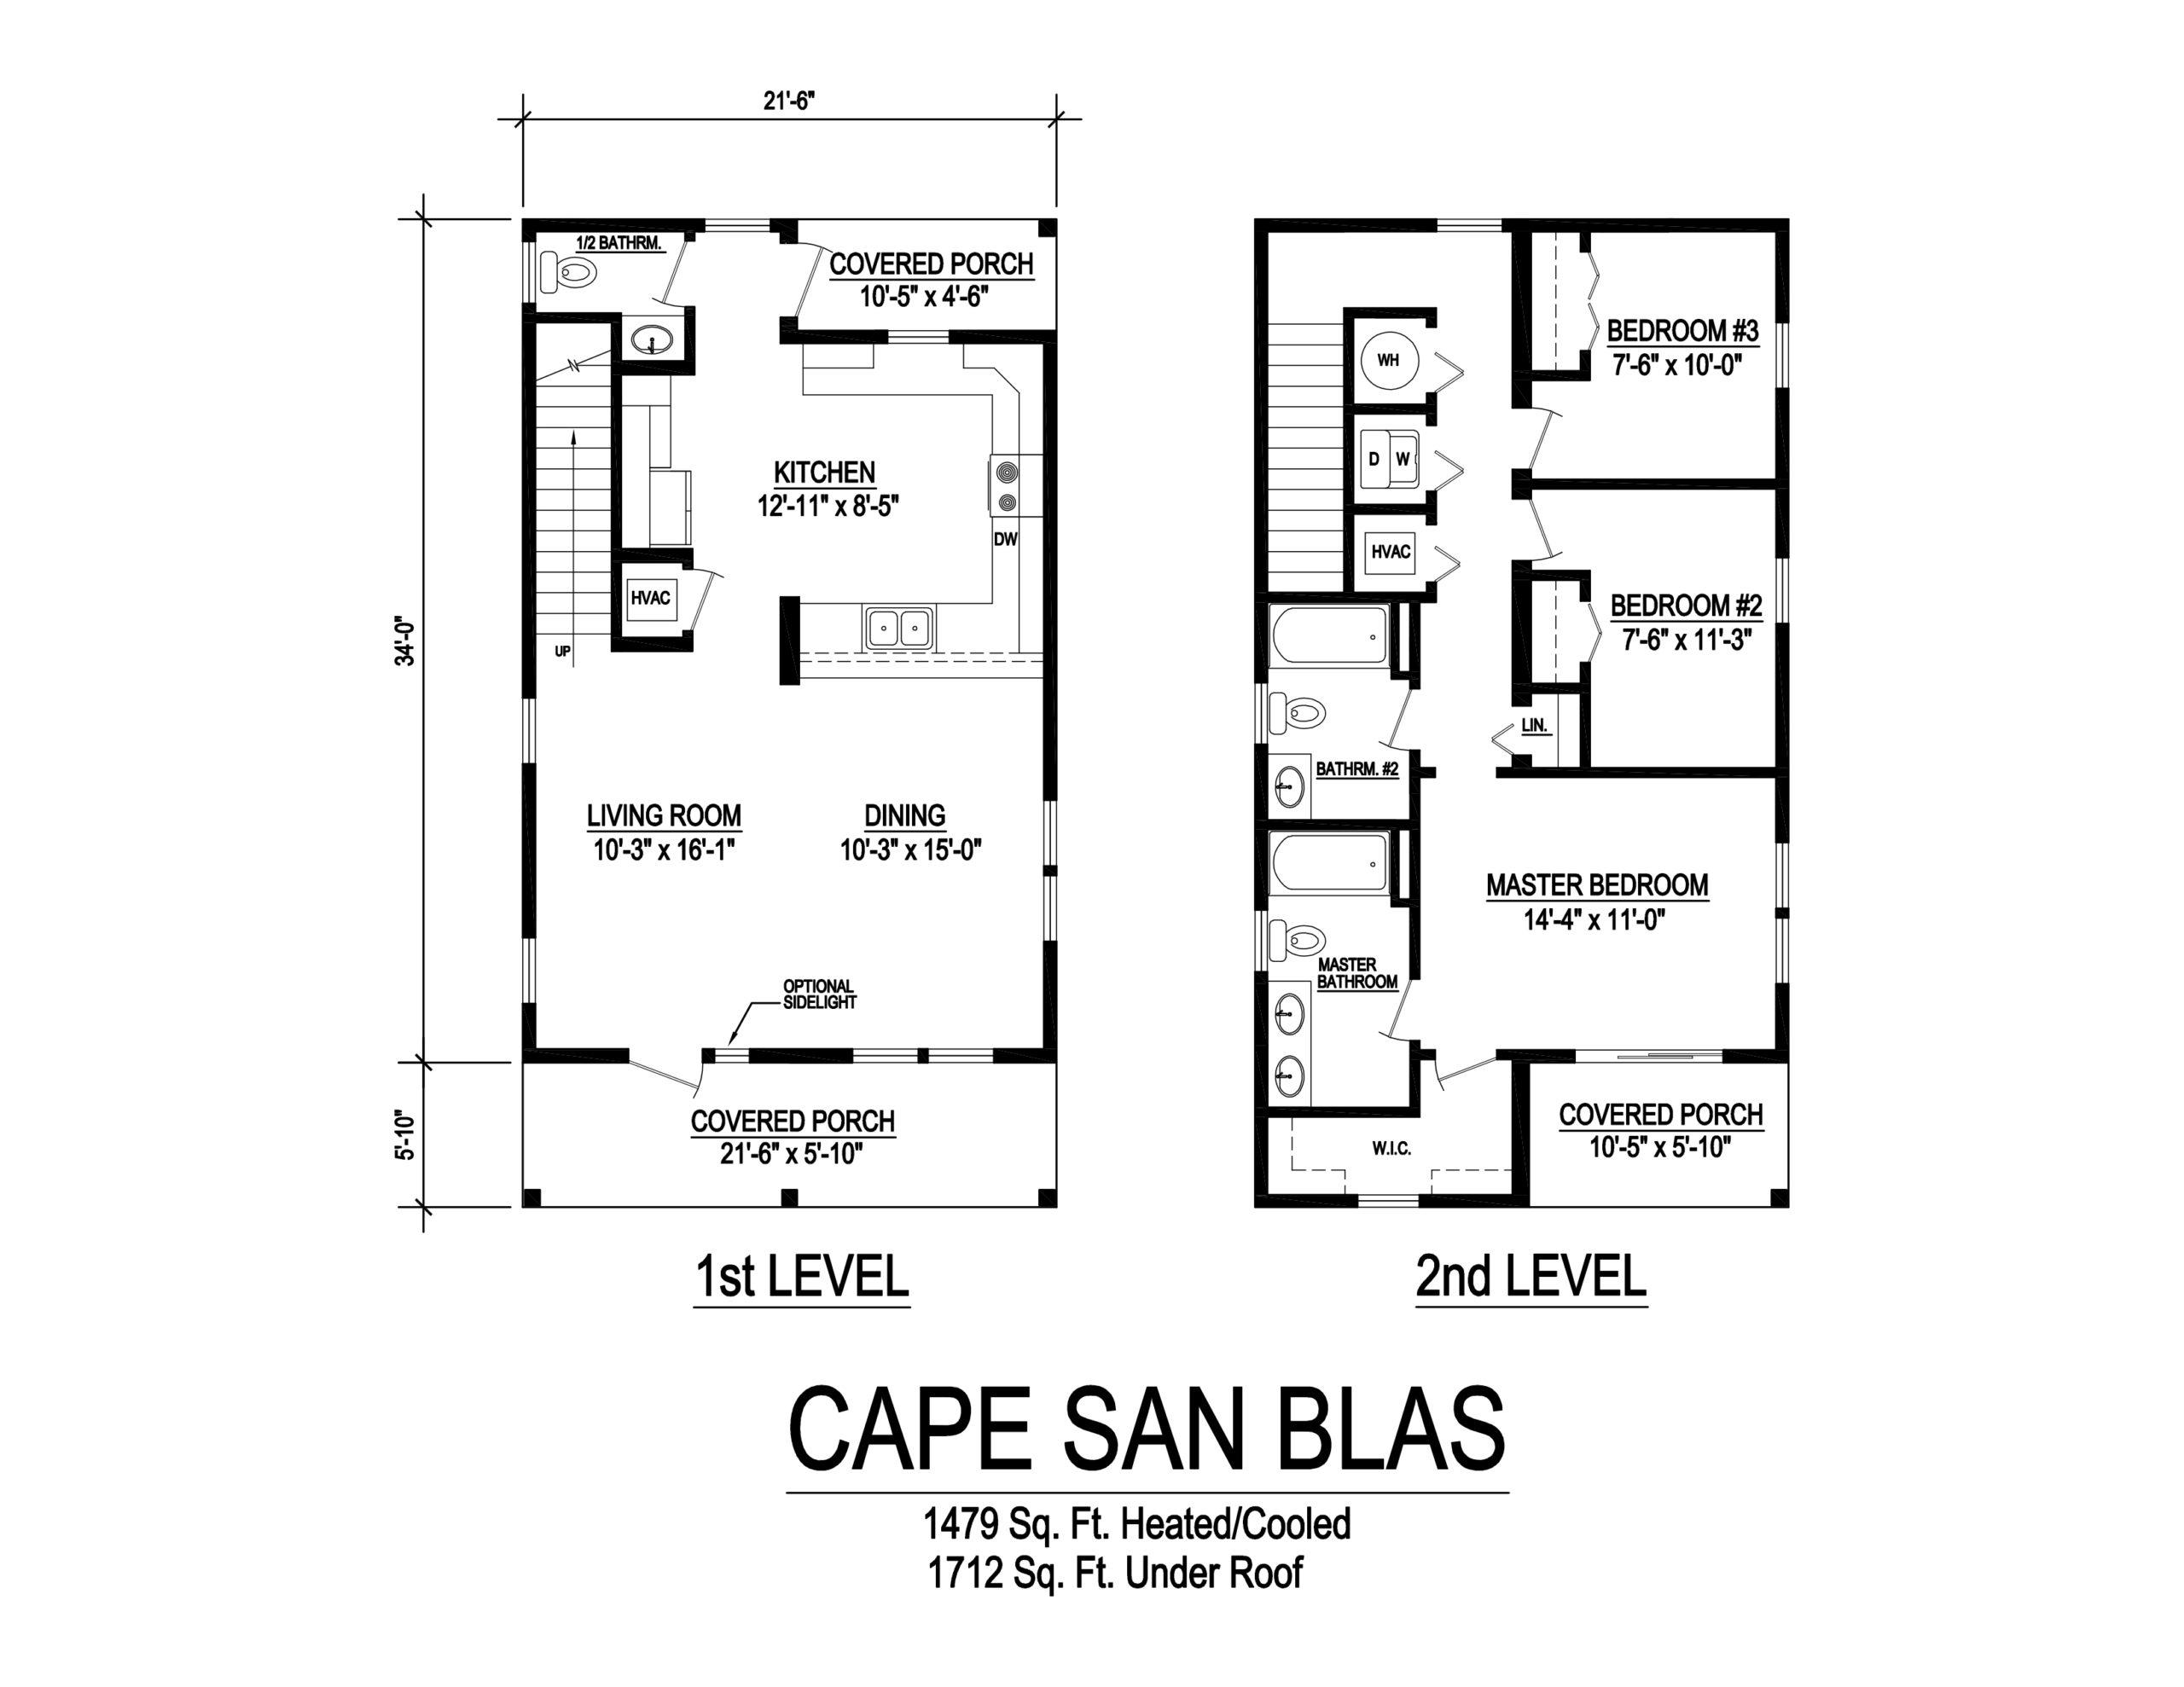 cape san blas modular home floorplan